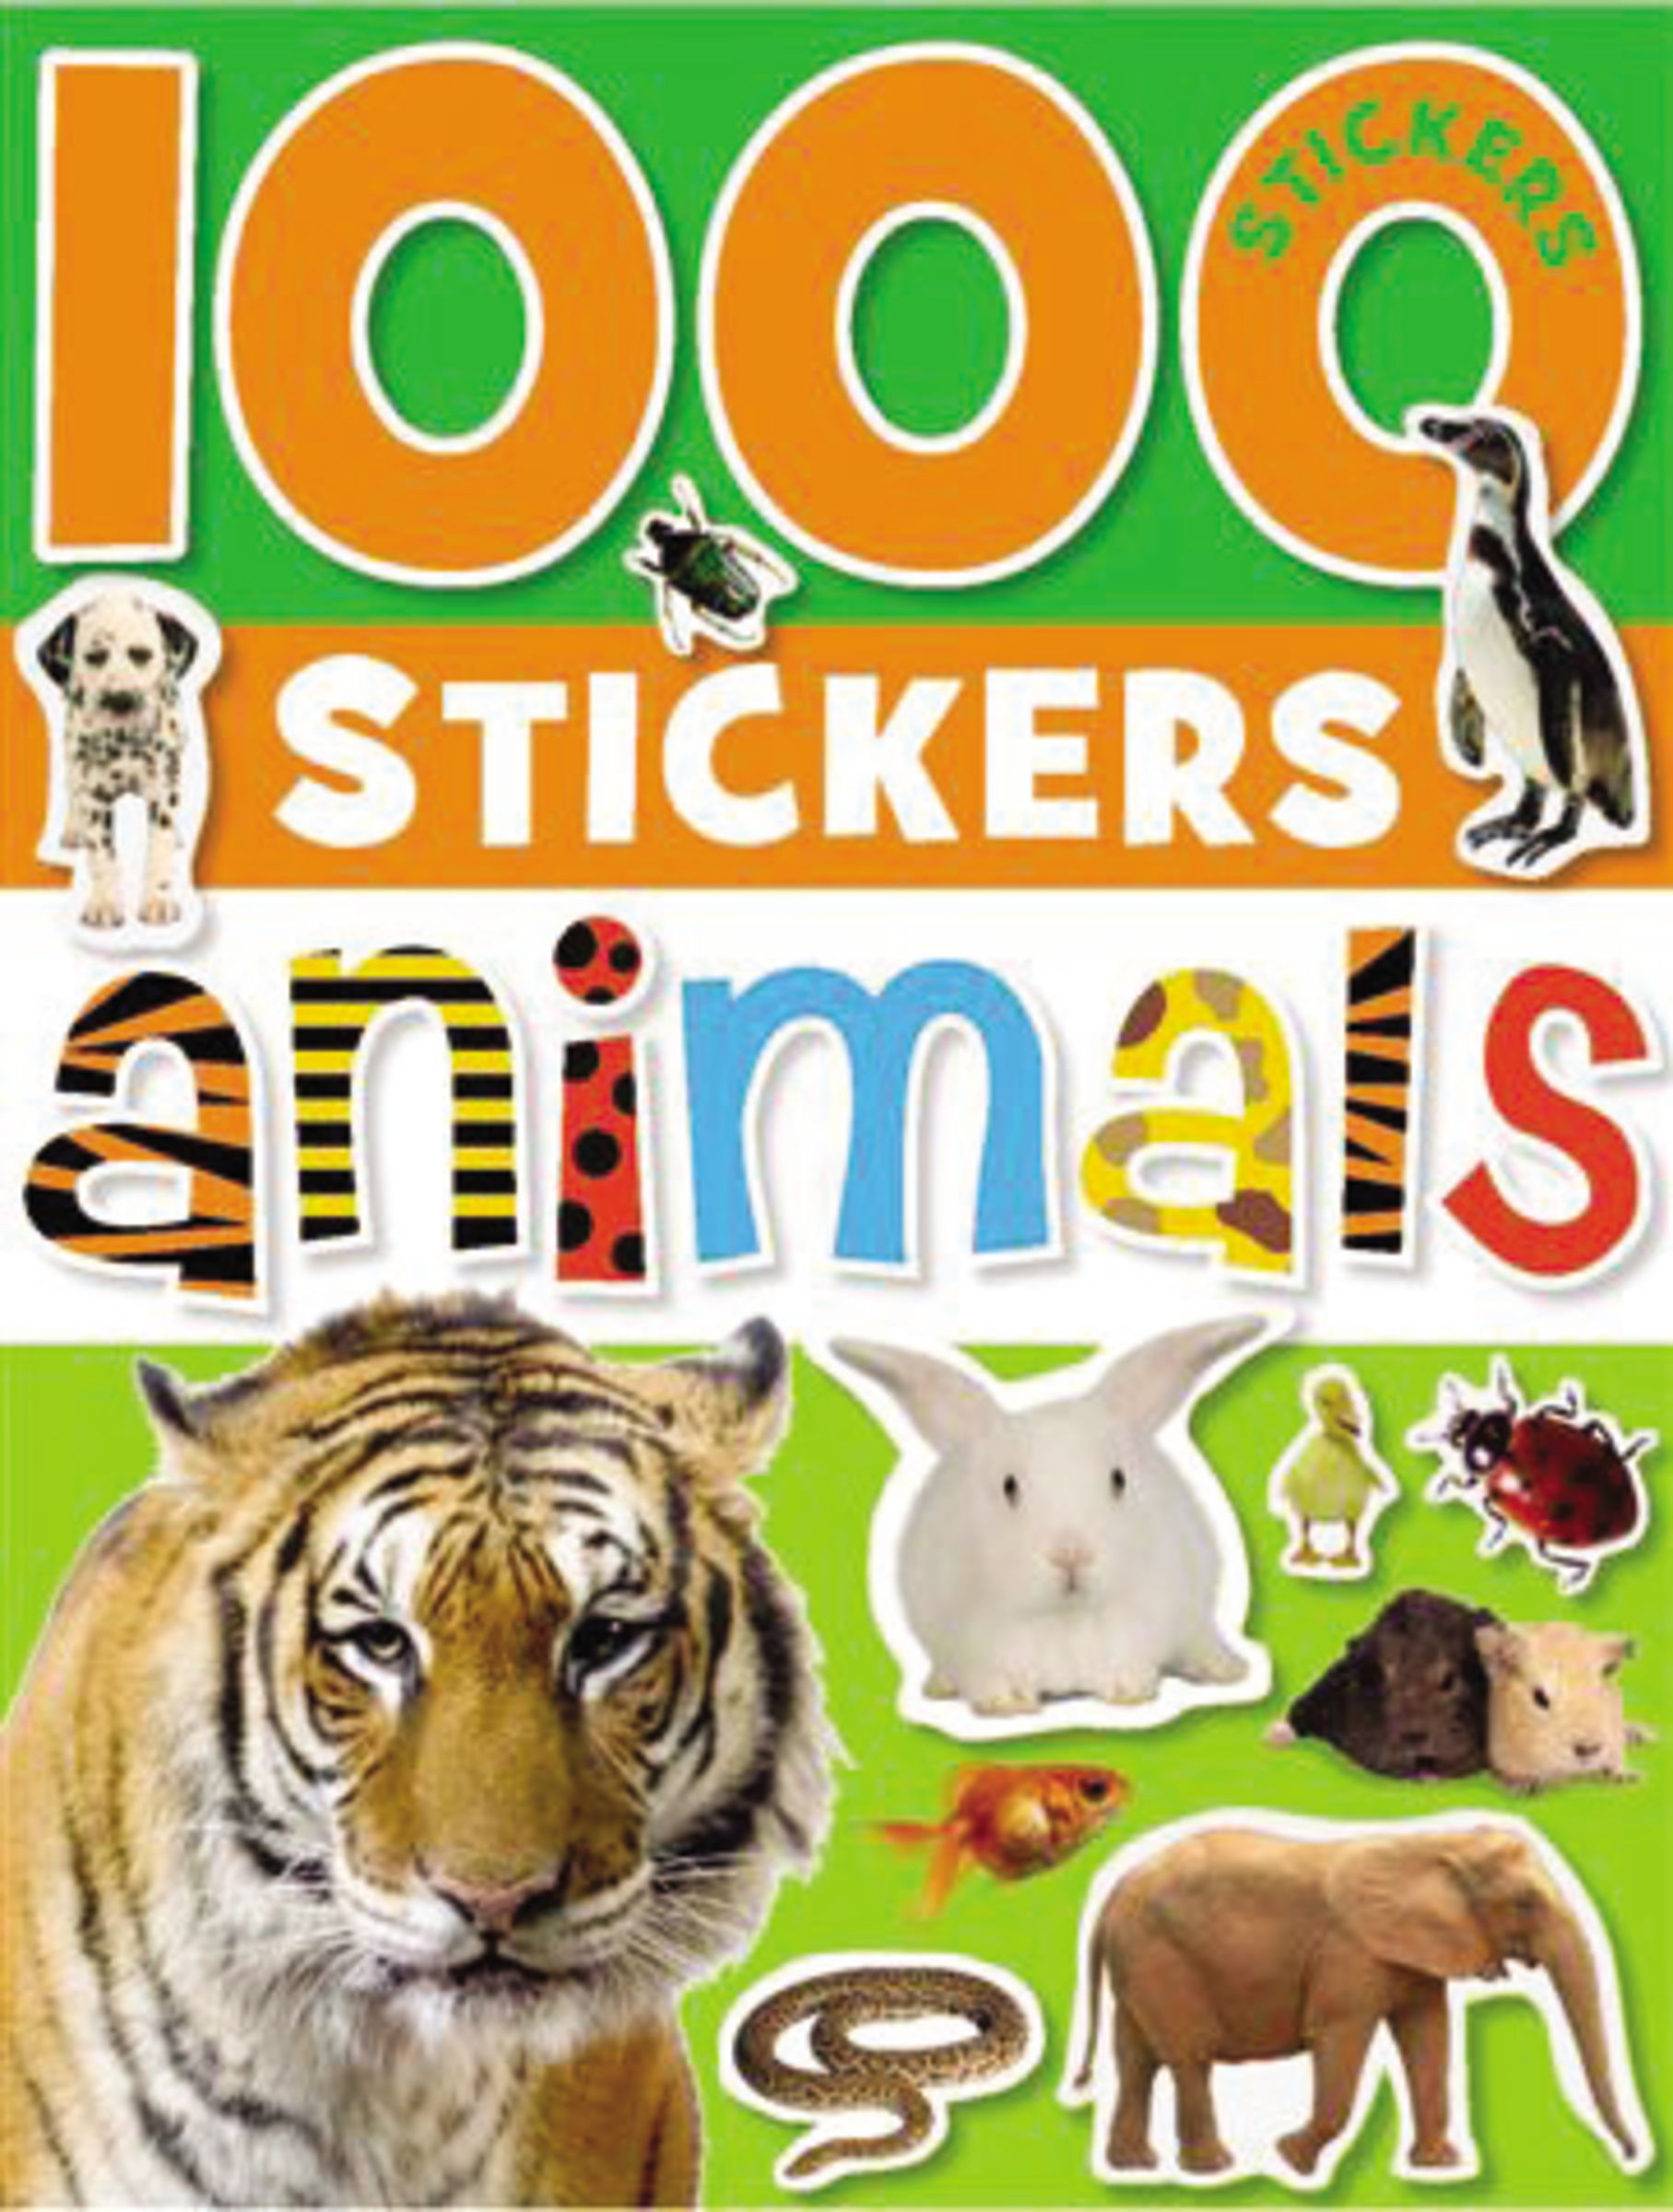 1000 Stickers - Animals